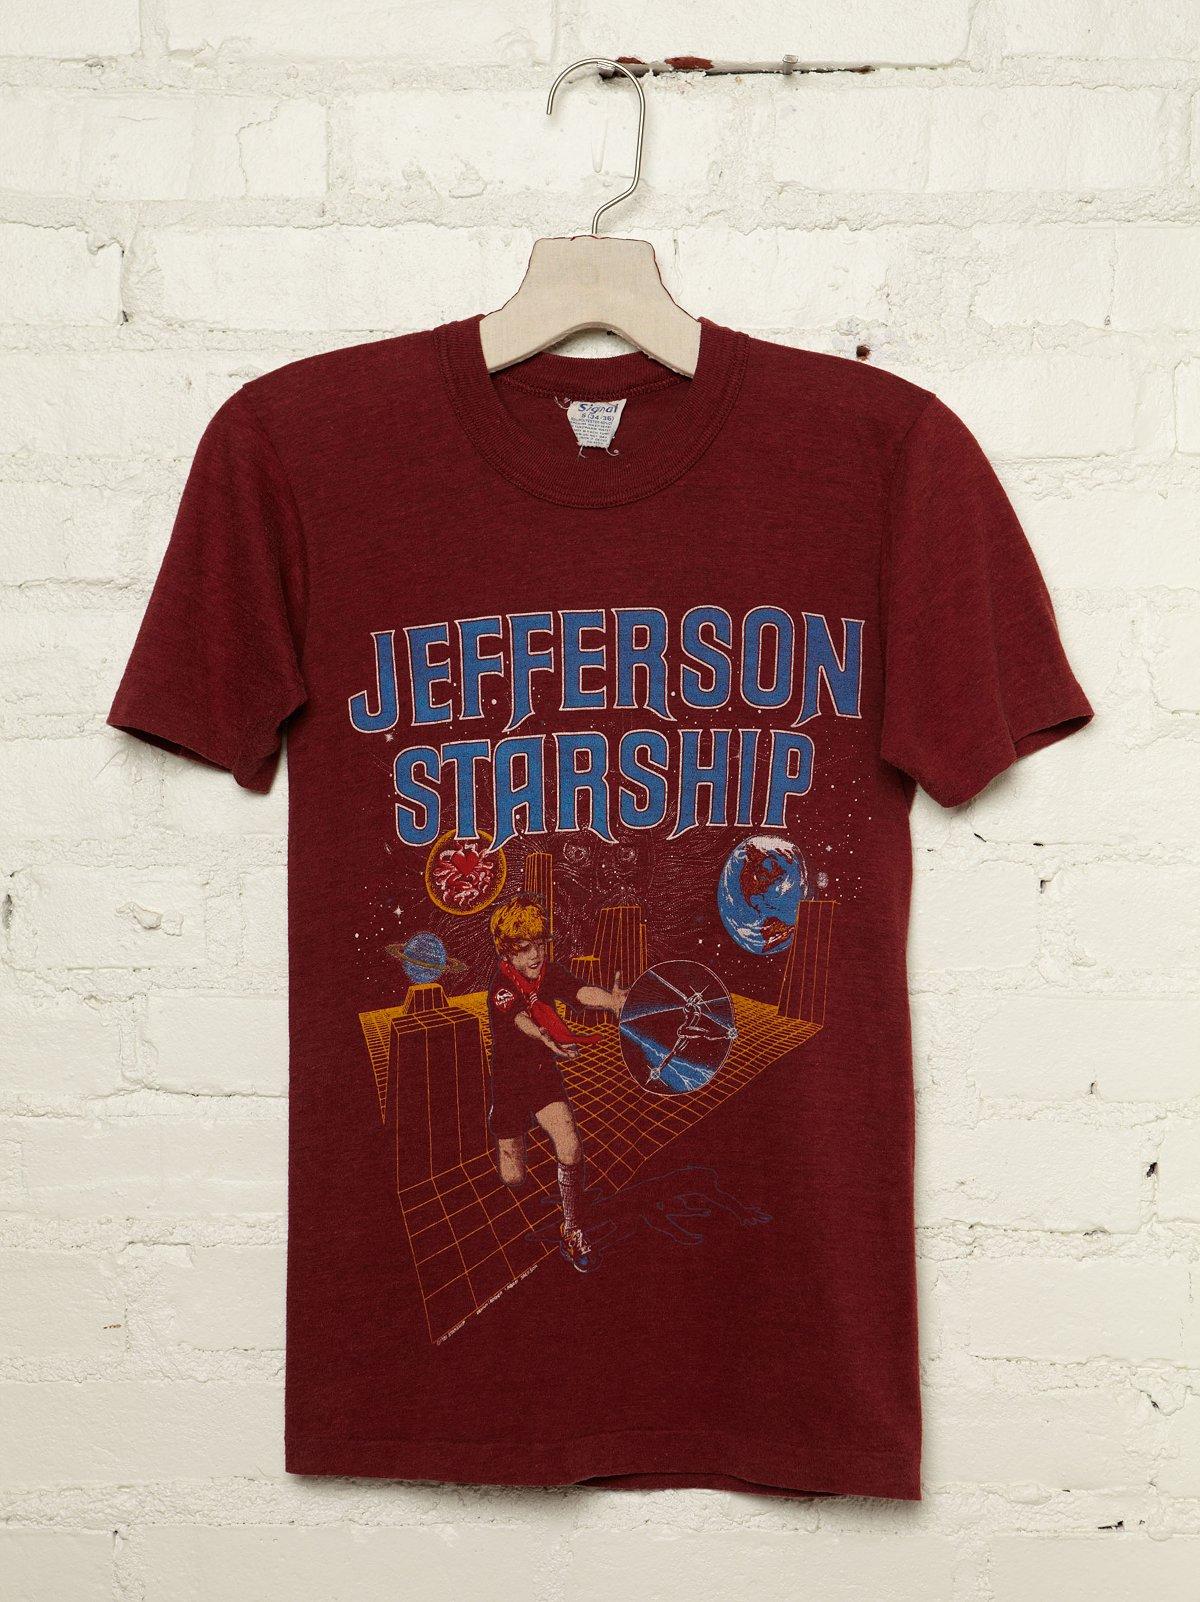 Vintage Jefferson Starship 1981 Graphic Tee